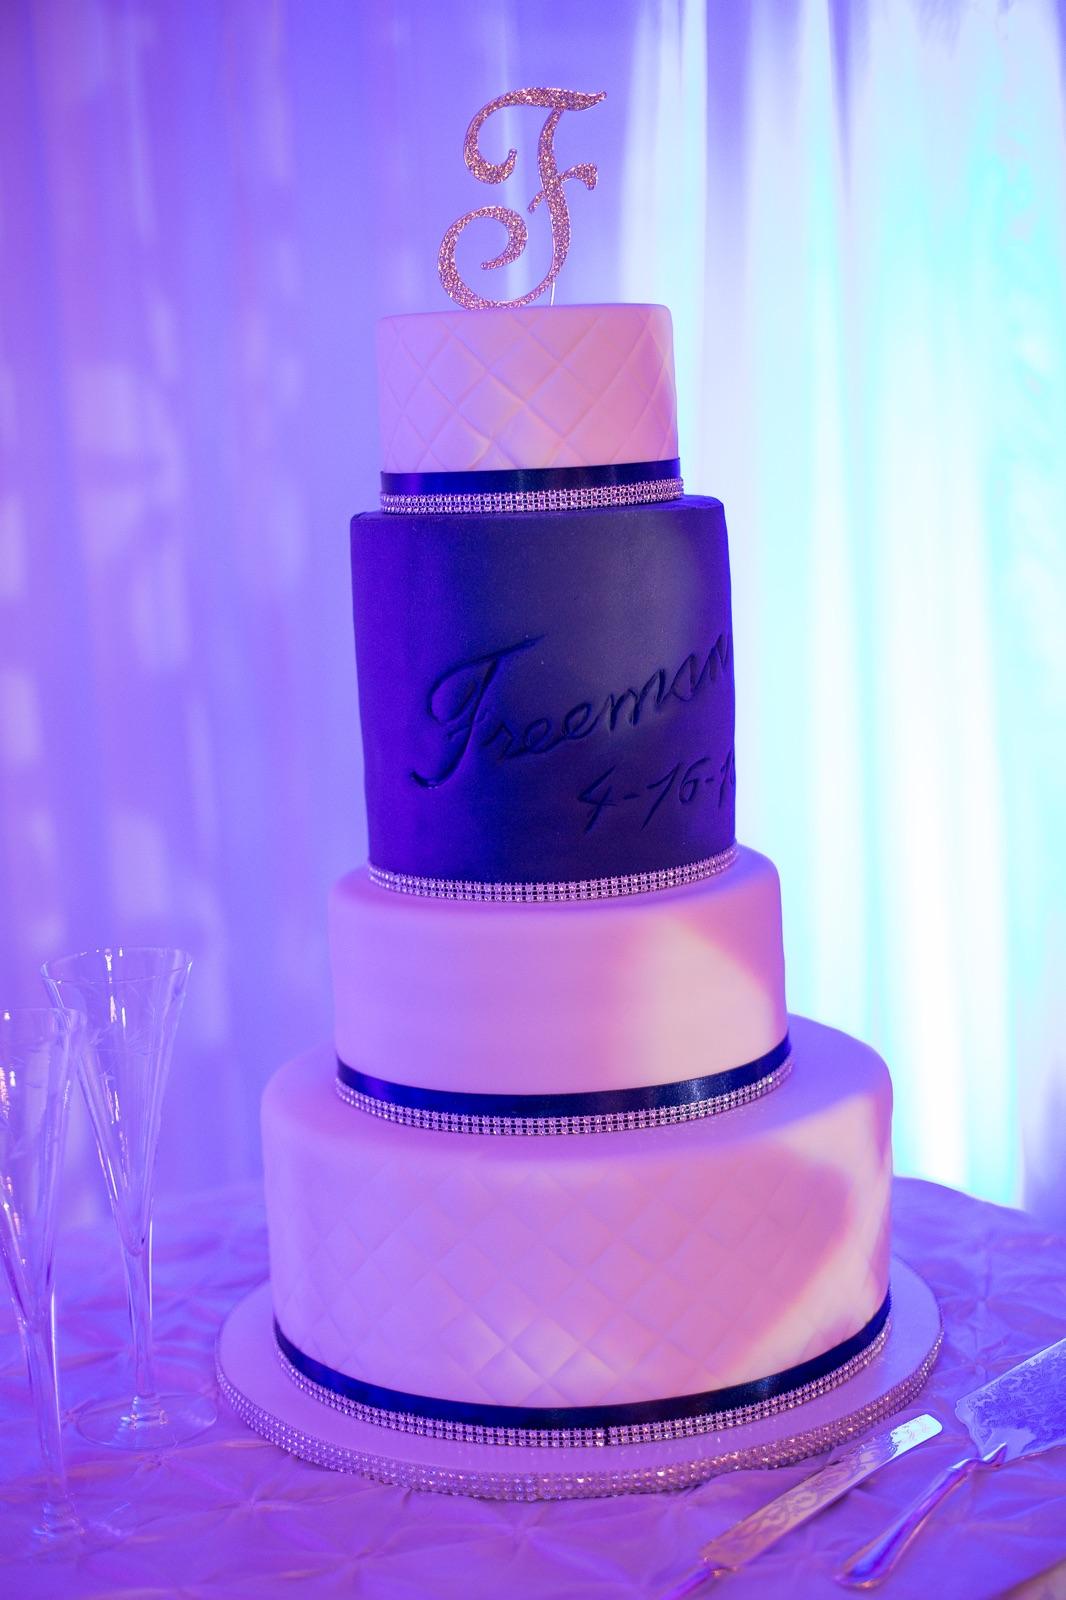 Freeman Wedding Cake with uplighting.jpg